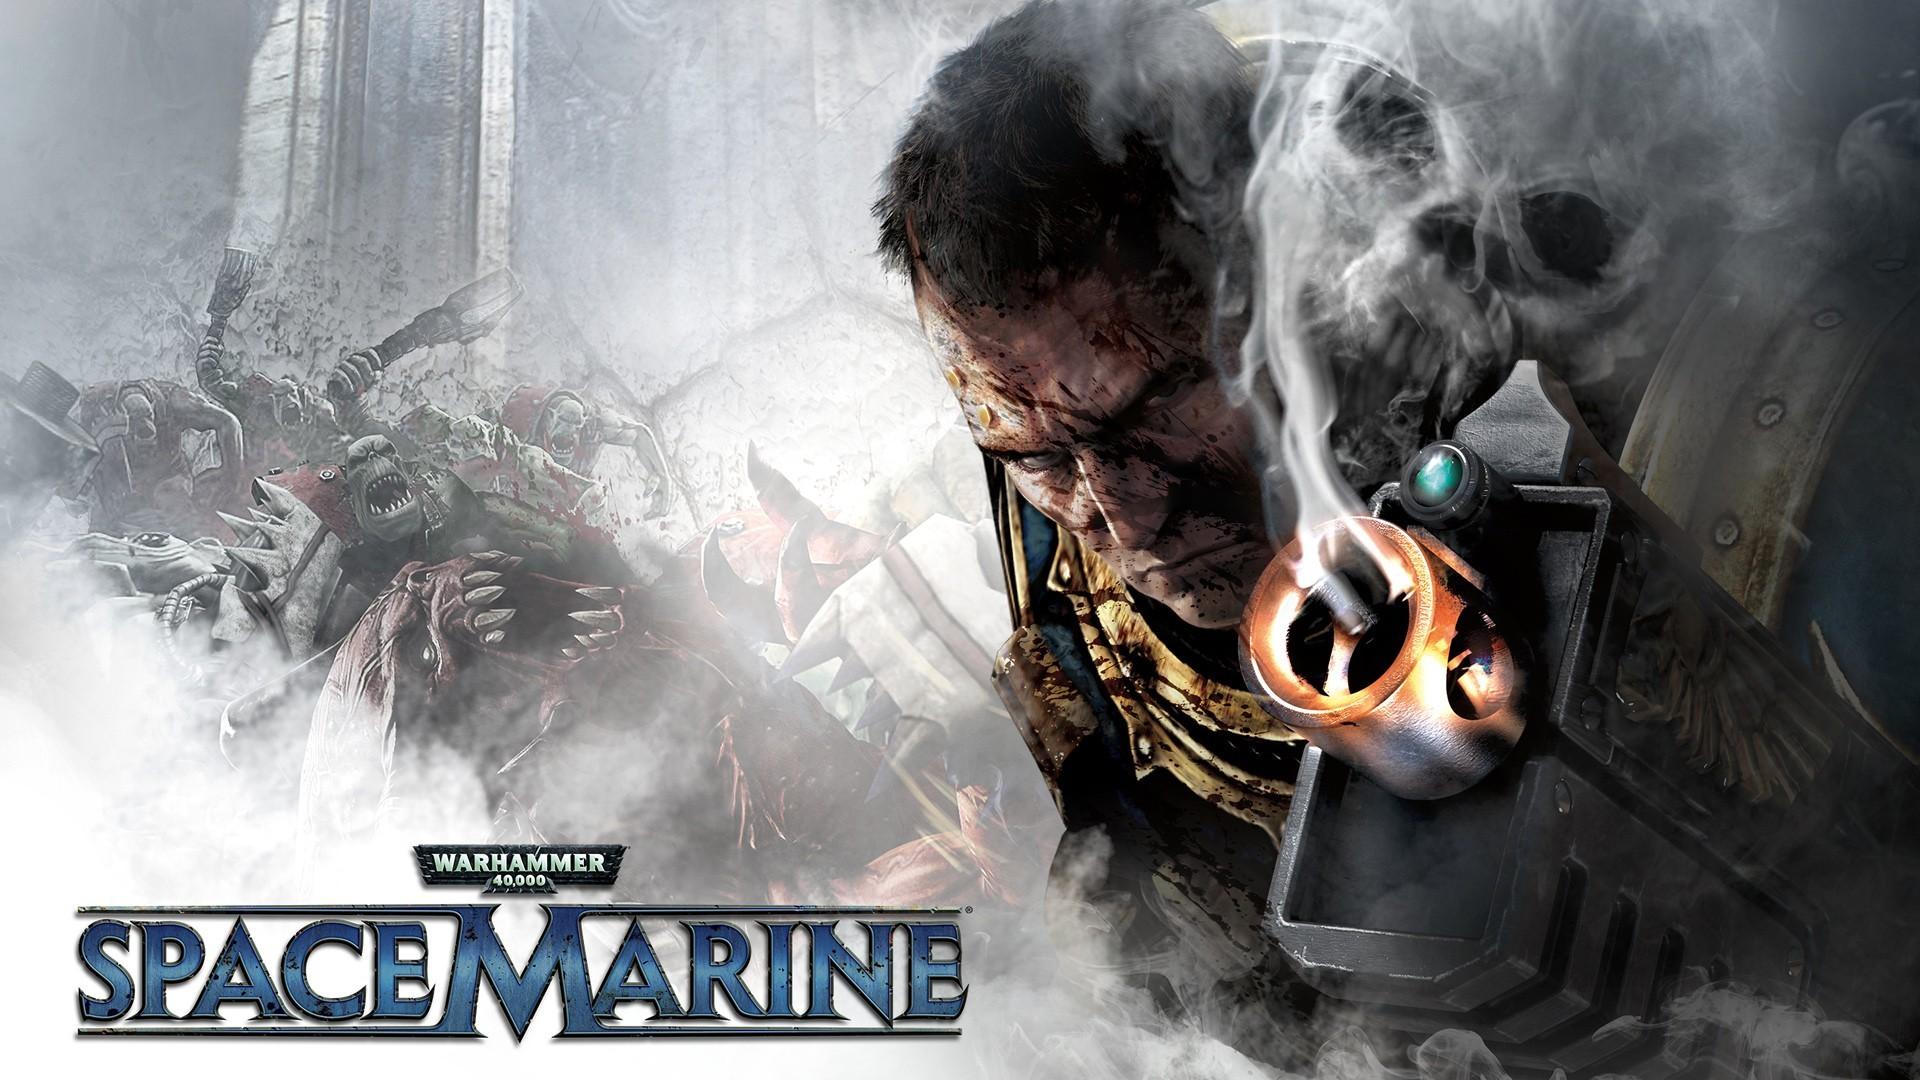 … x 1080 Original. Description: Download Warhammer Space Marine Game  Games wallpaper …